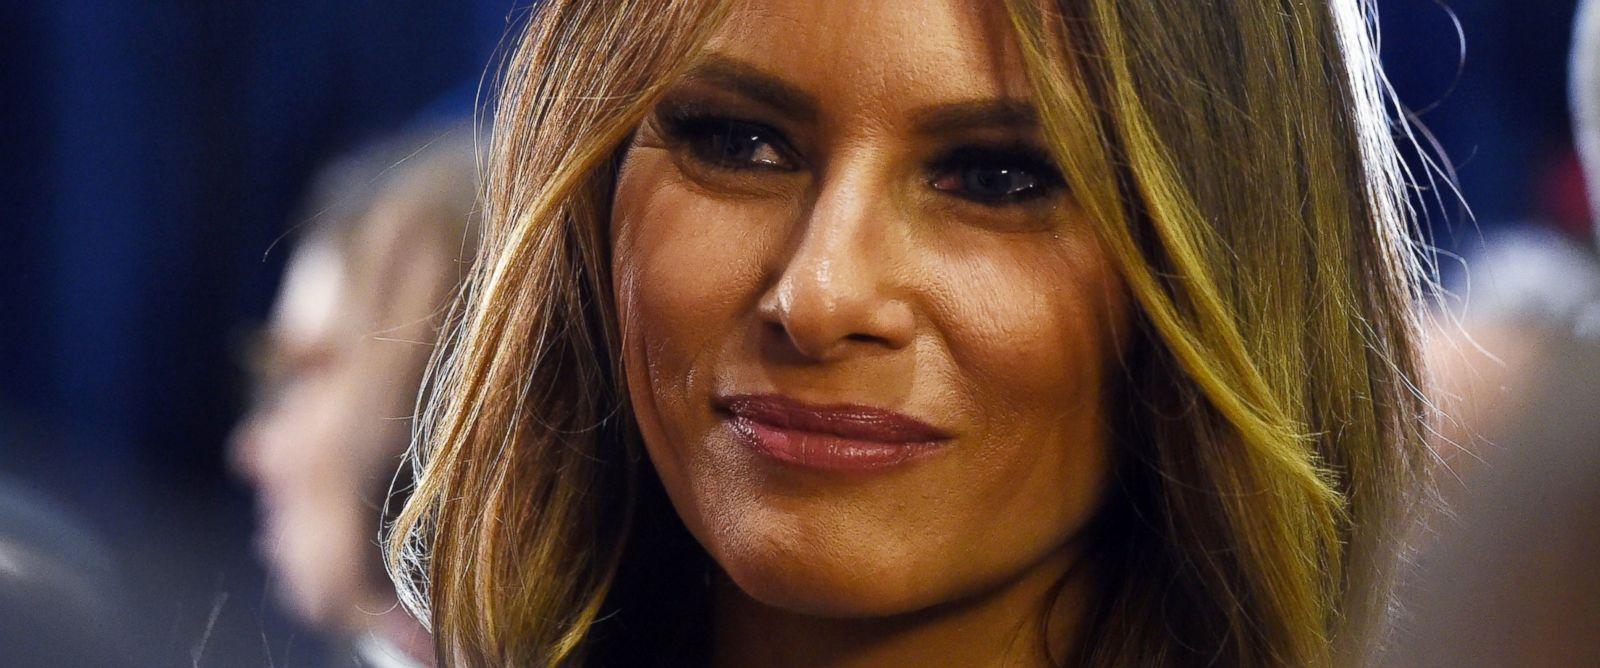 A Glimpse of Melania Trump's Childhood in Slovenia - ABC News